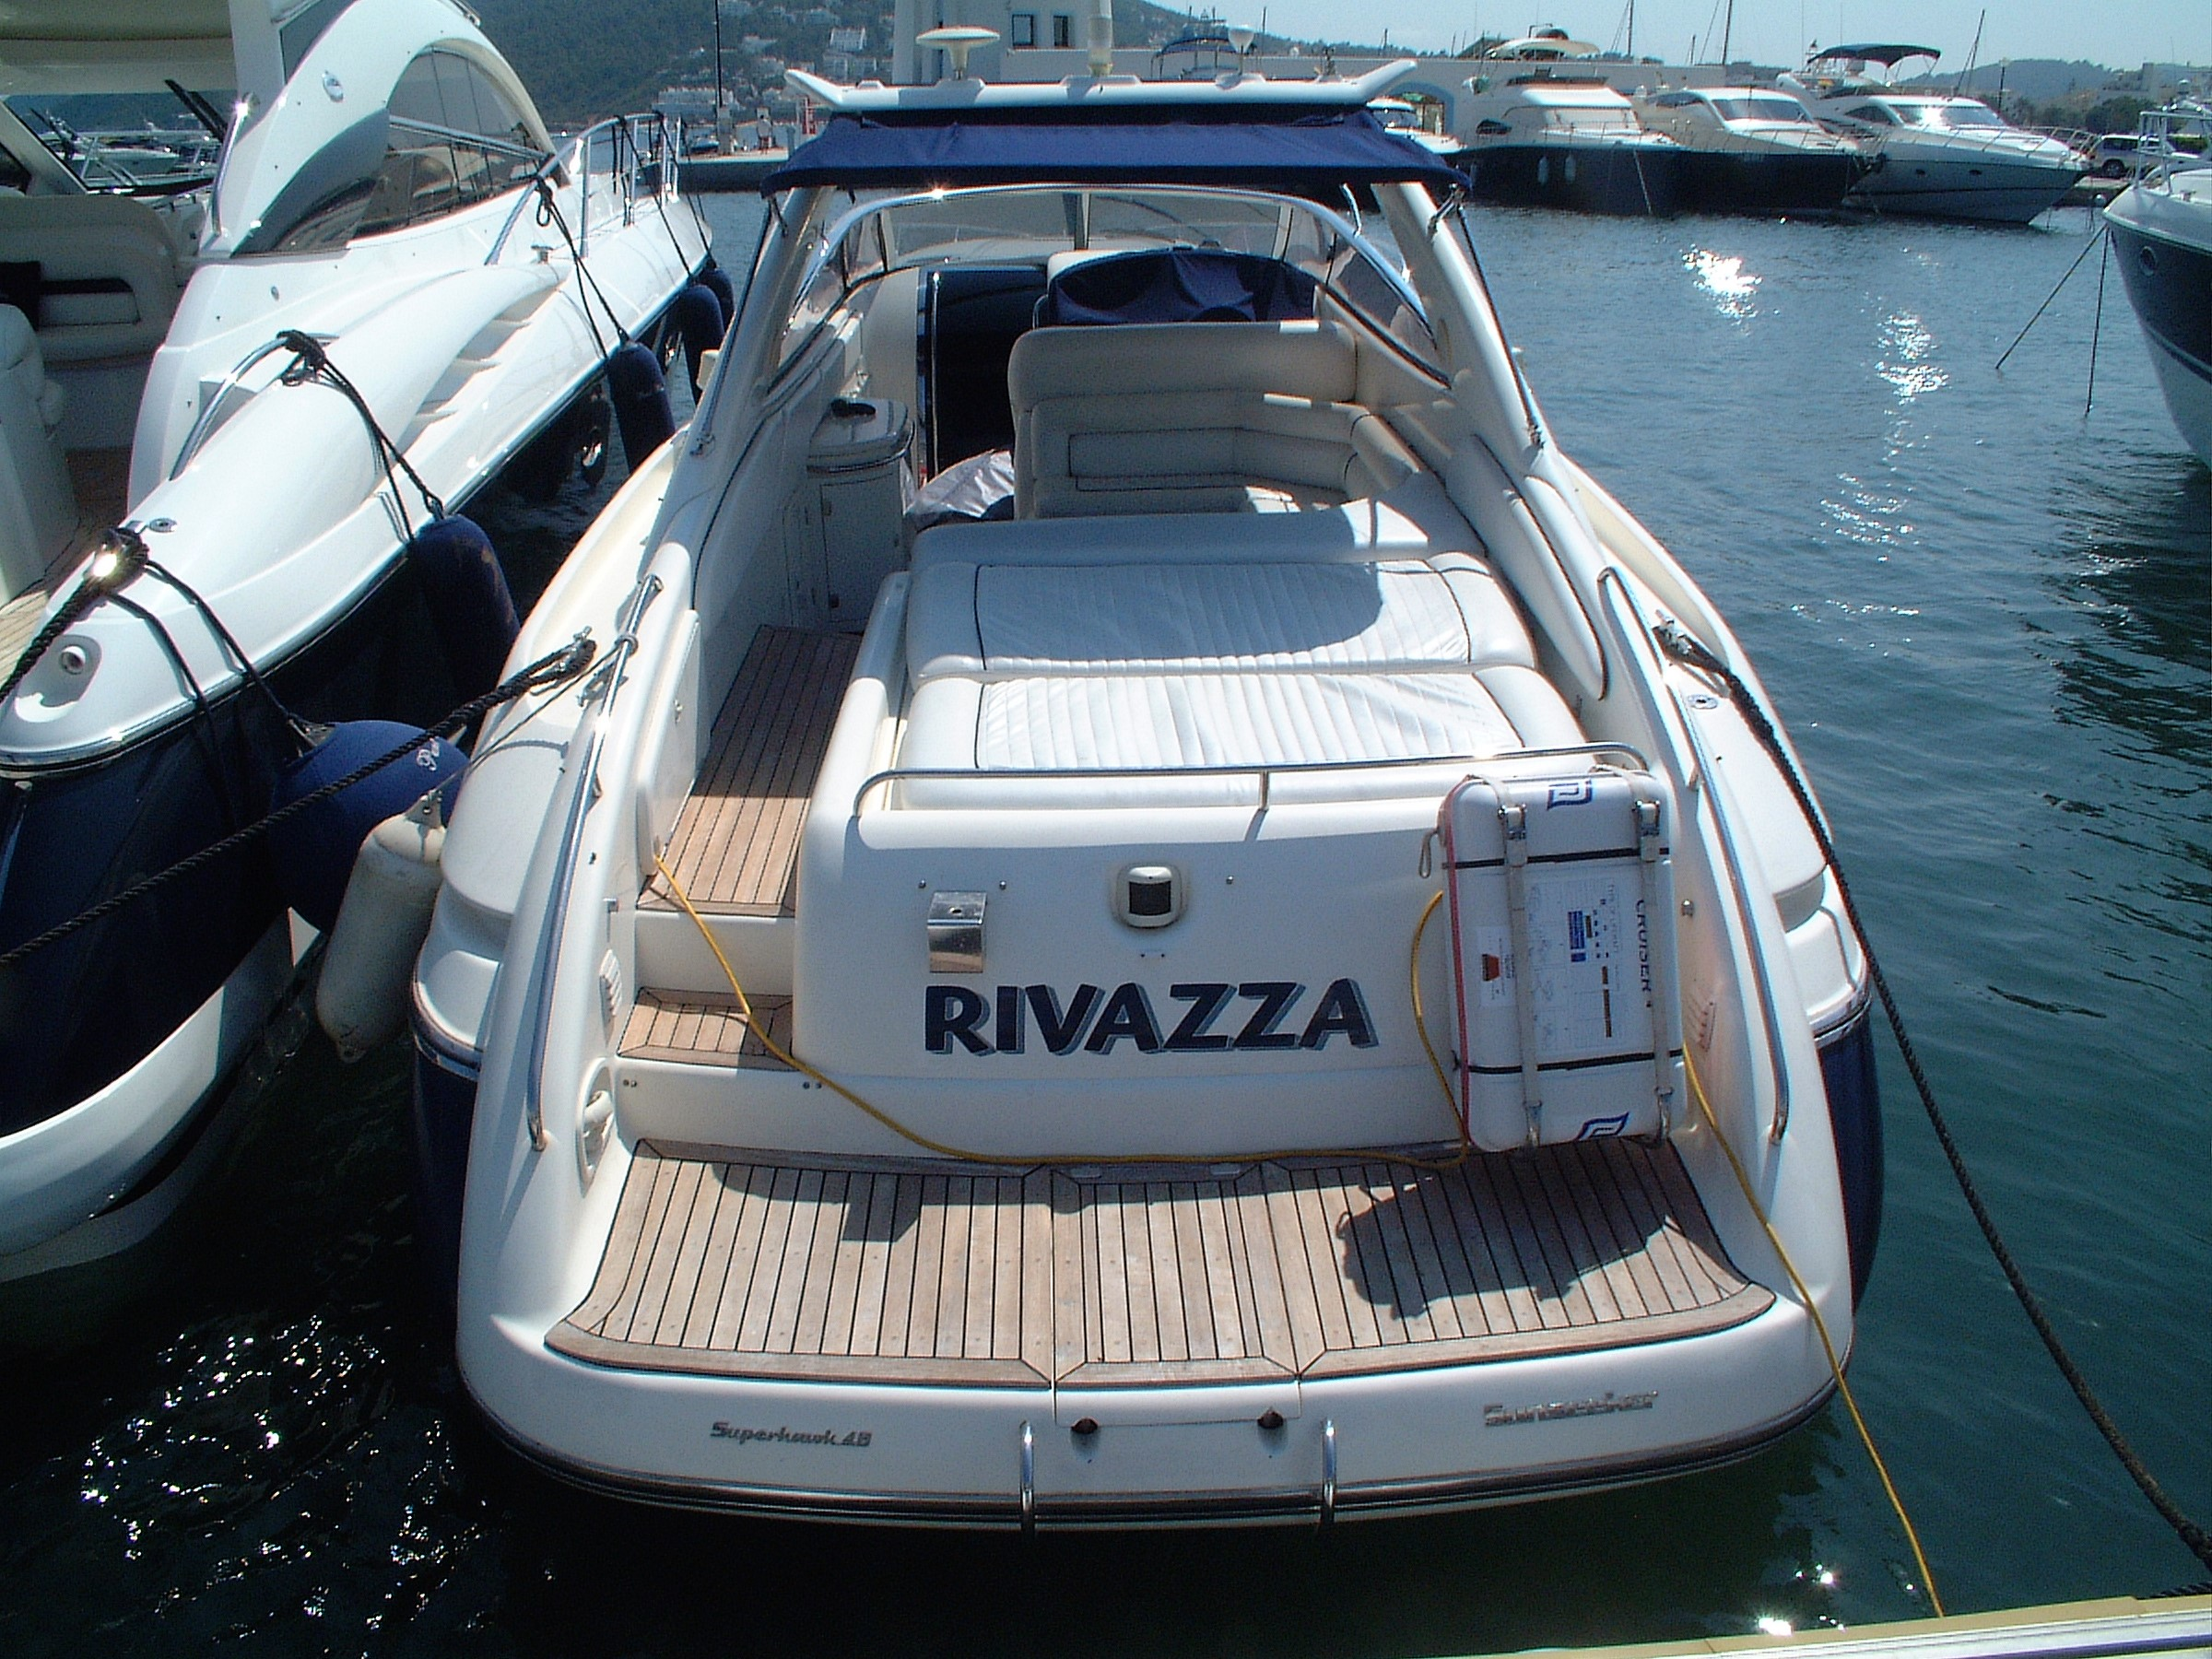 Rivazza 04.JPG